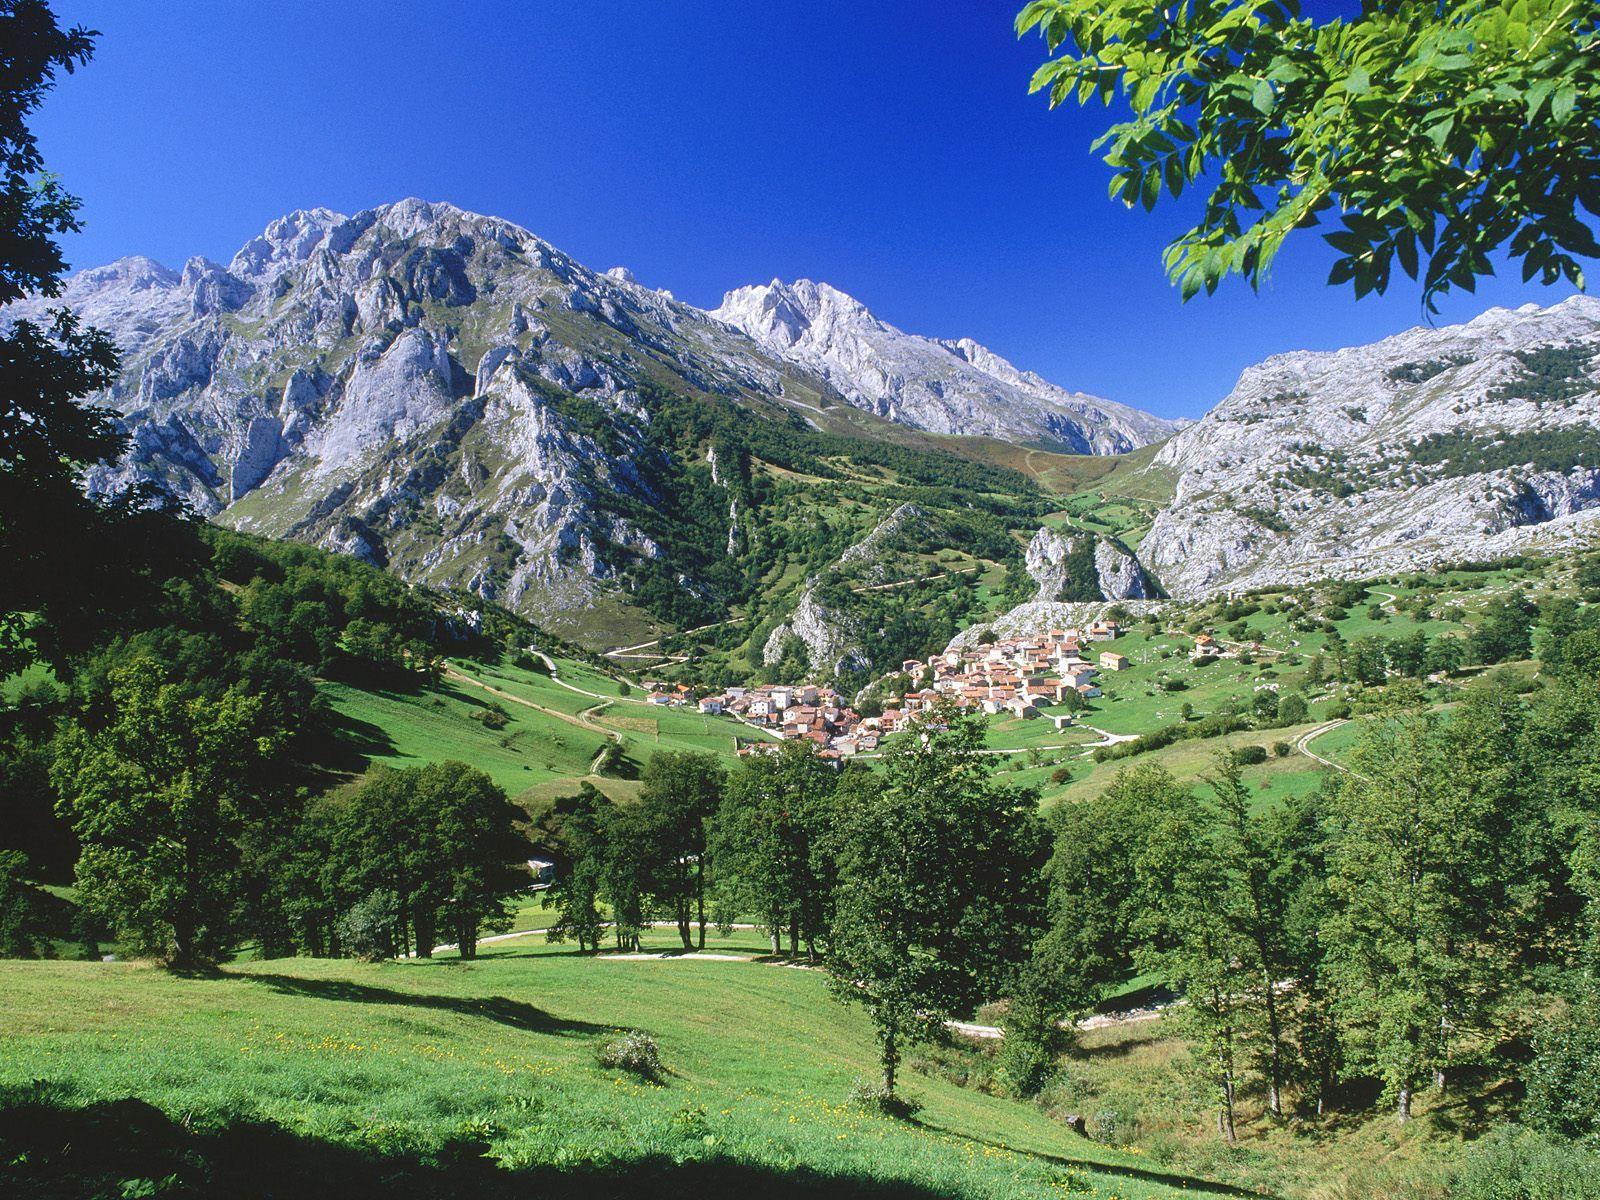 Mountains Waterfalls Photo Mountains Places In Spain Europe Wallpaper Asturias